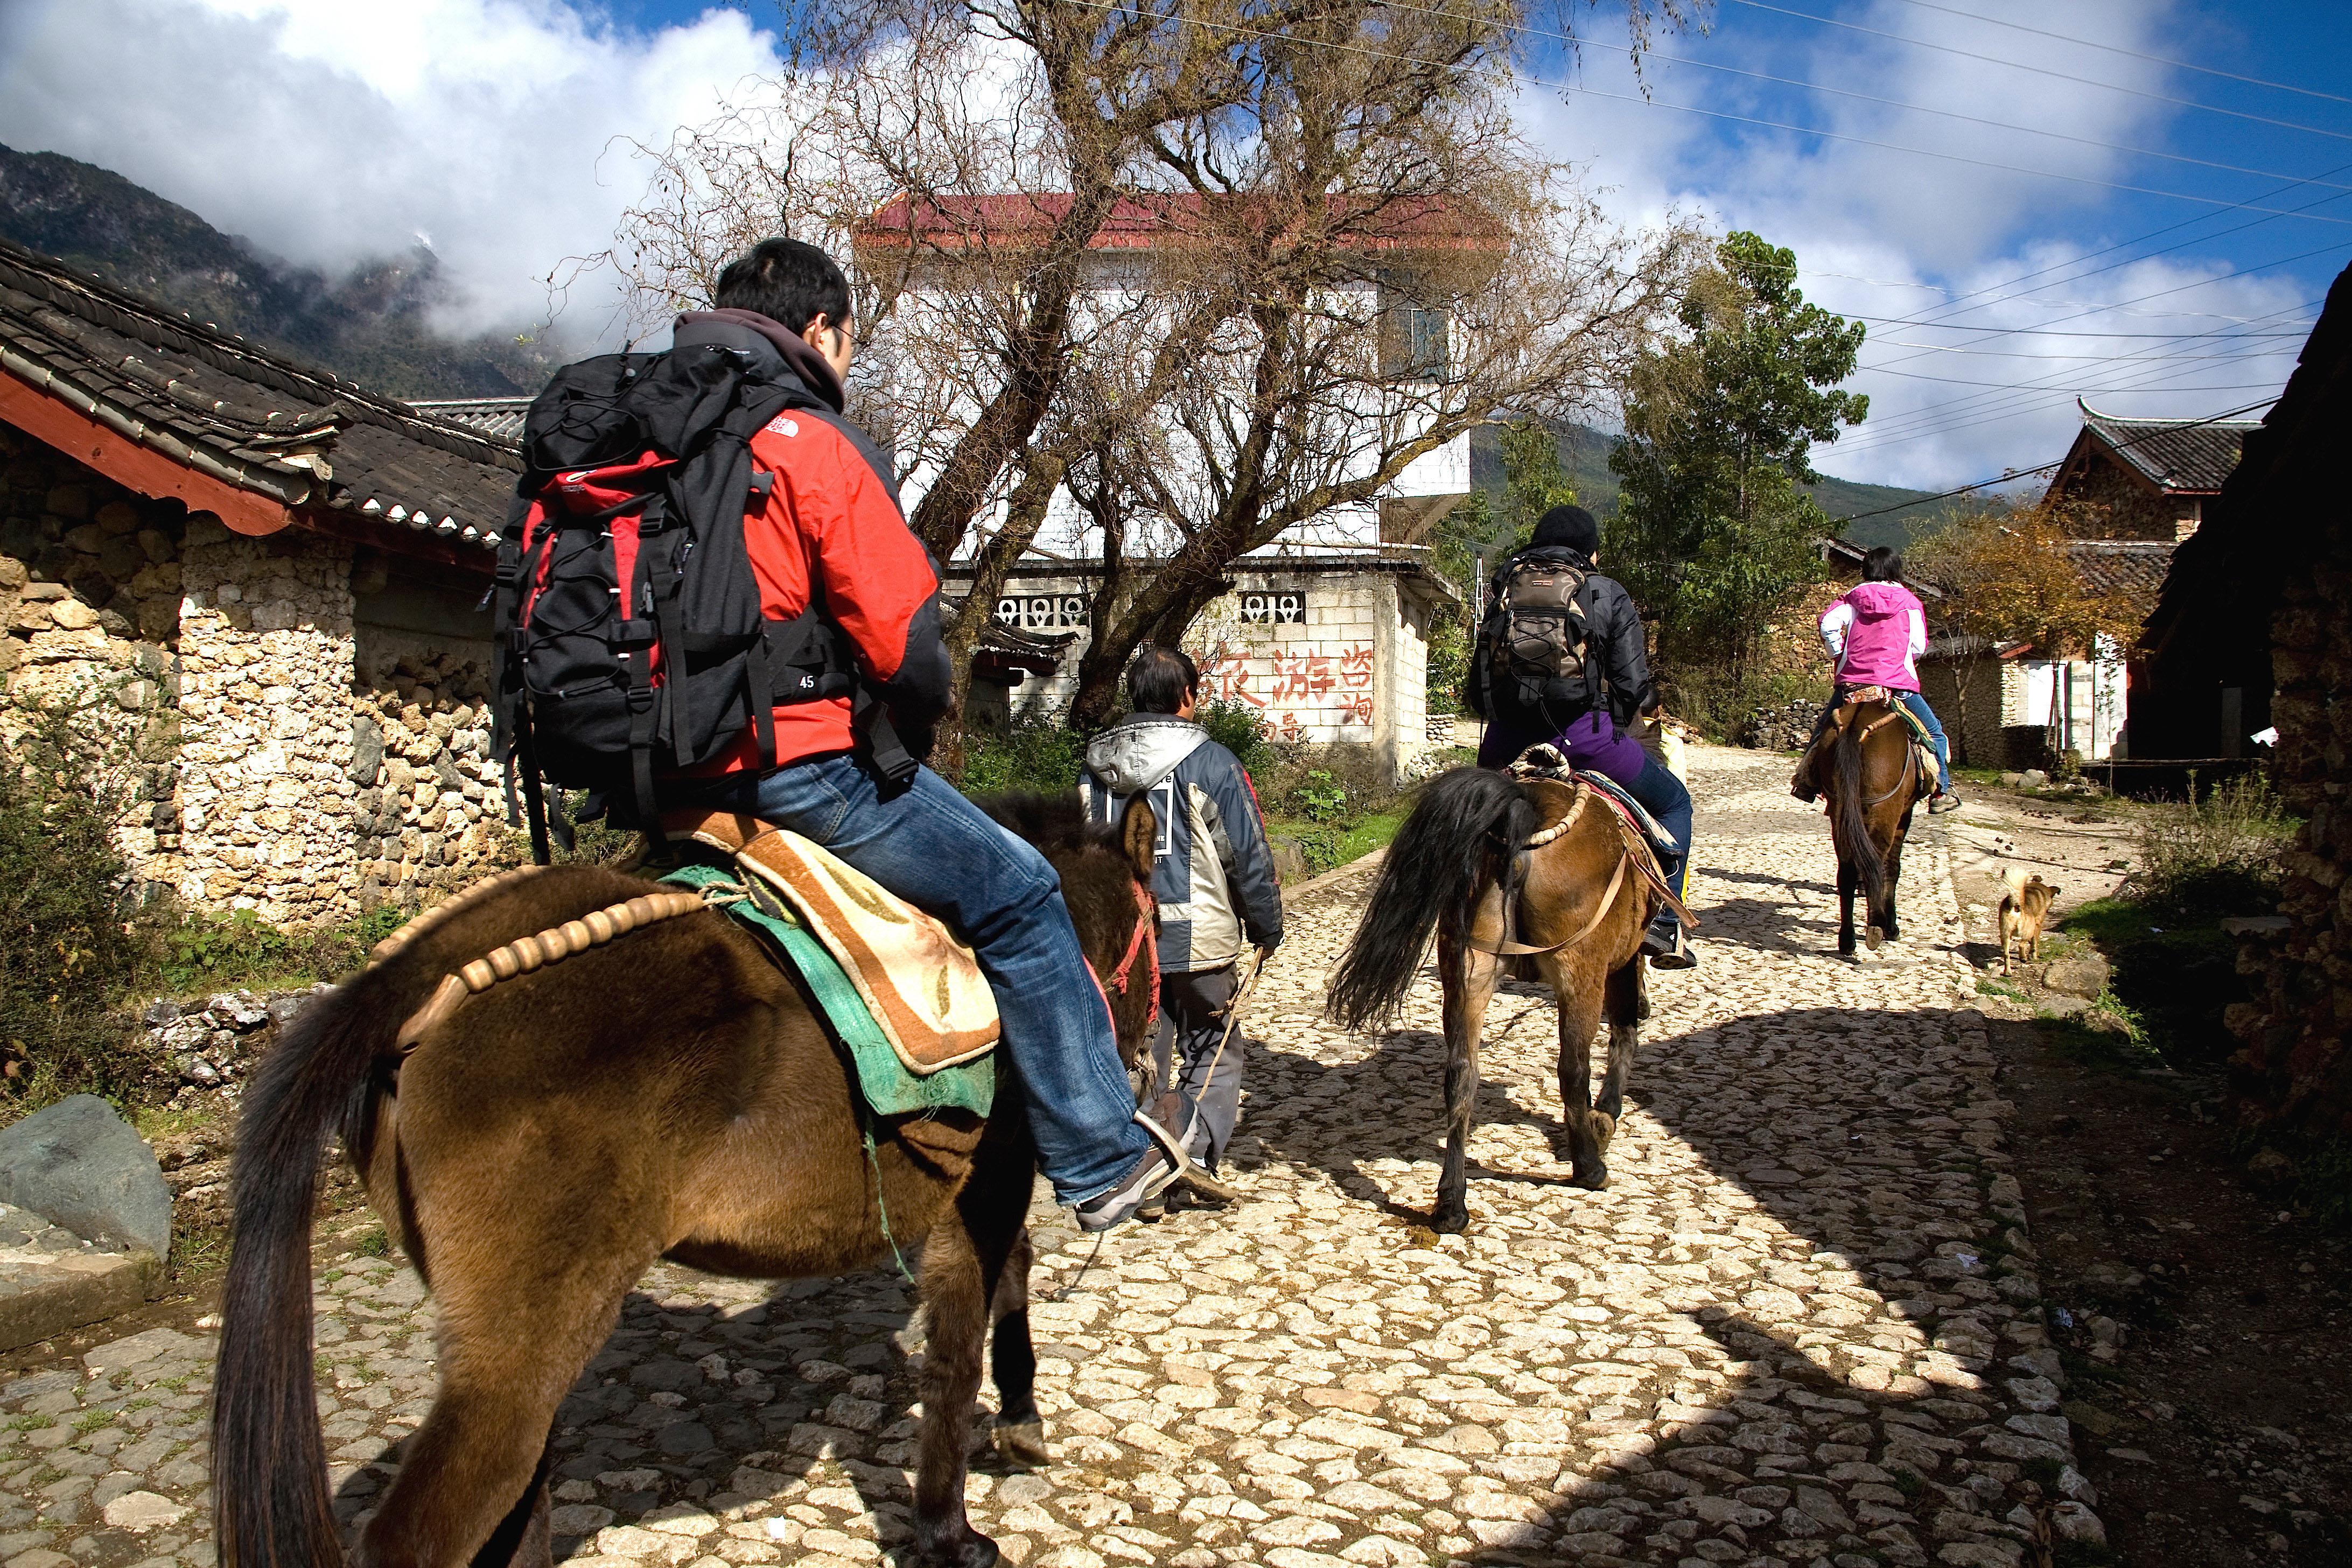 Travelers on horseback to countryside